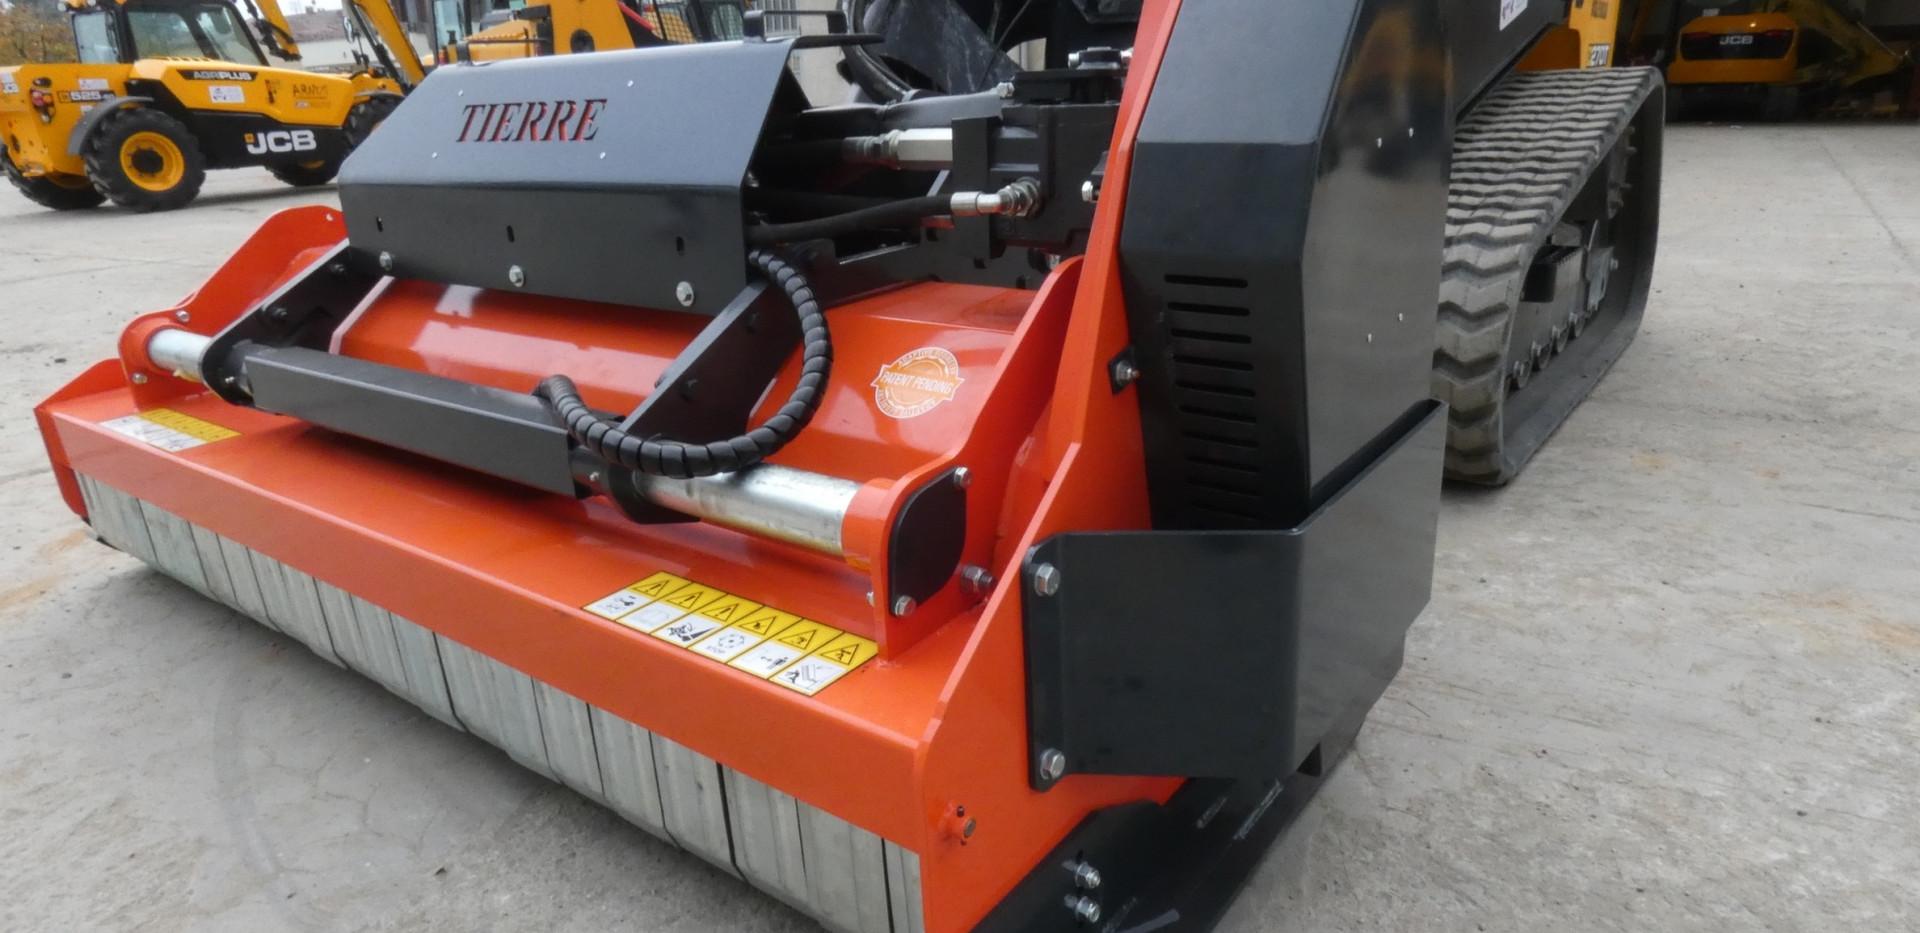 hydro-pantera-tierre-trinciatrice-idraul